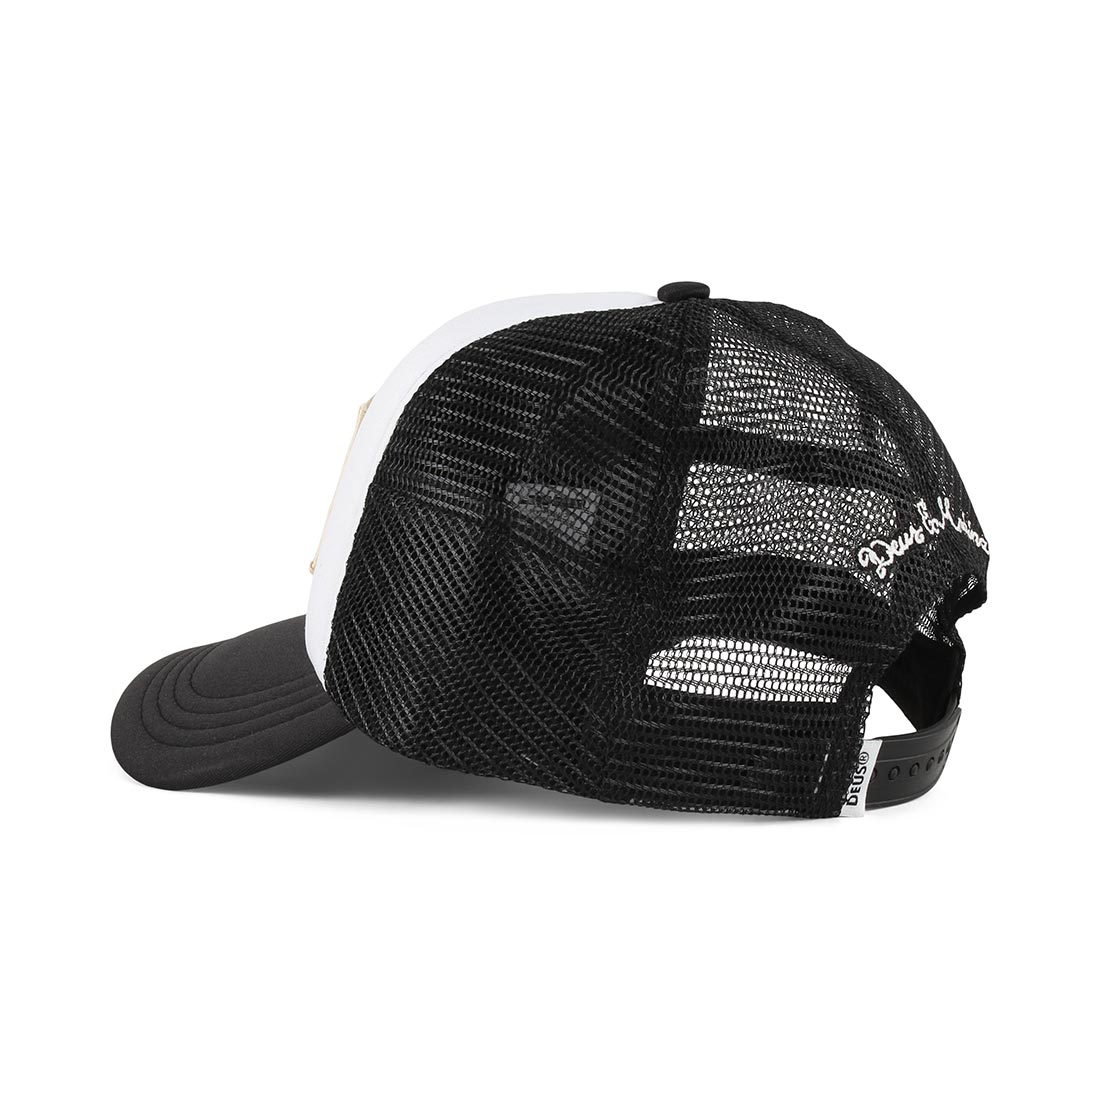 Deus Ex Machina Moretown Mesh Back Trucker Cap - White / Black